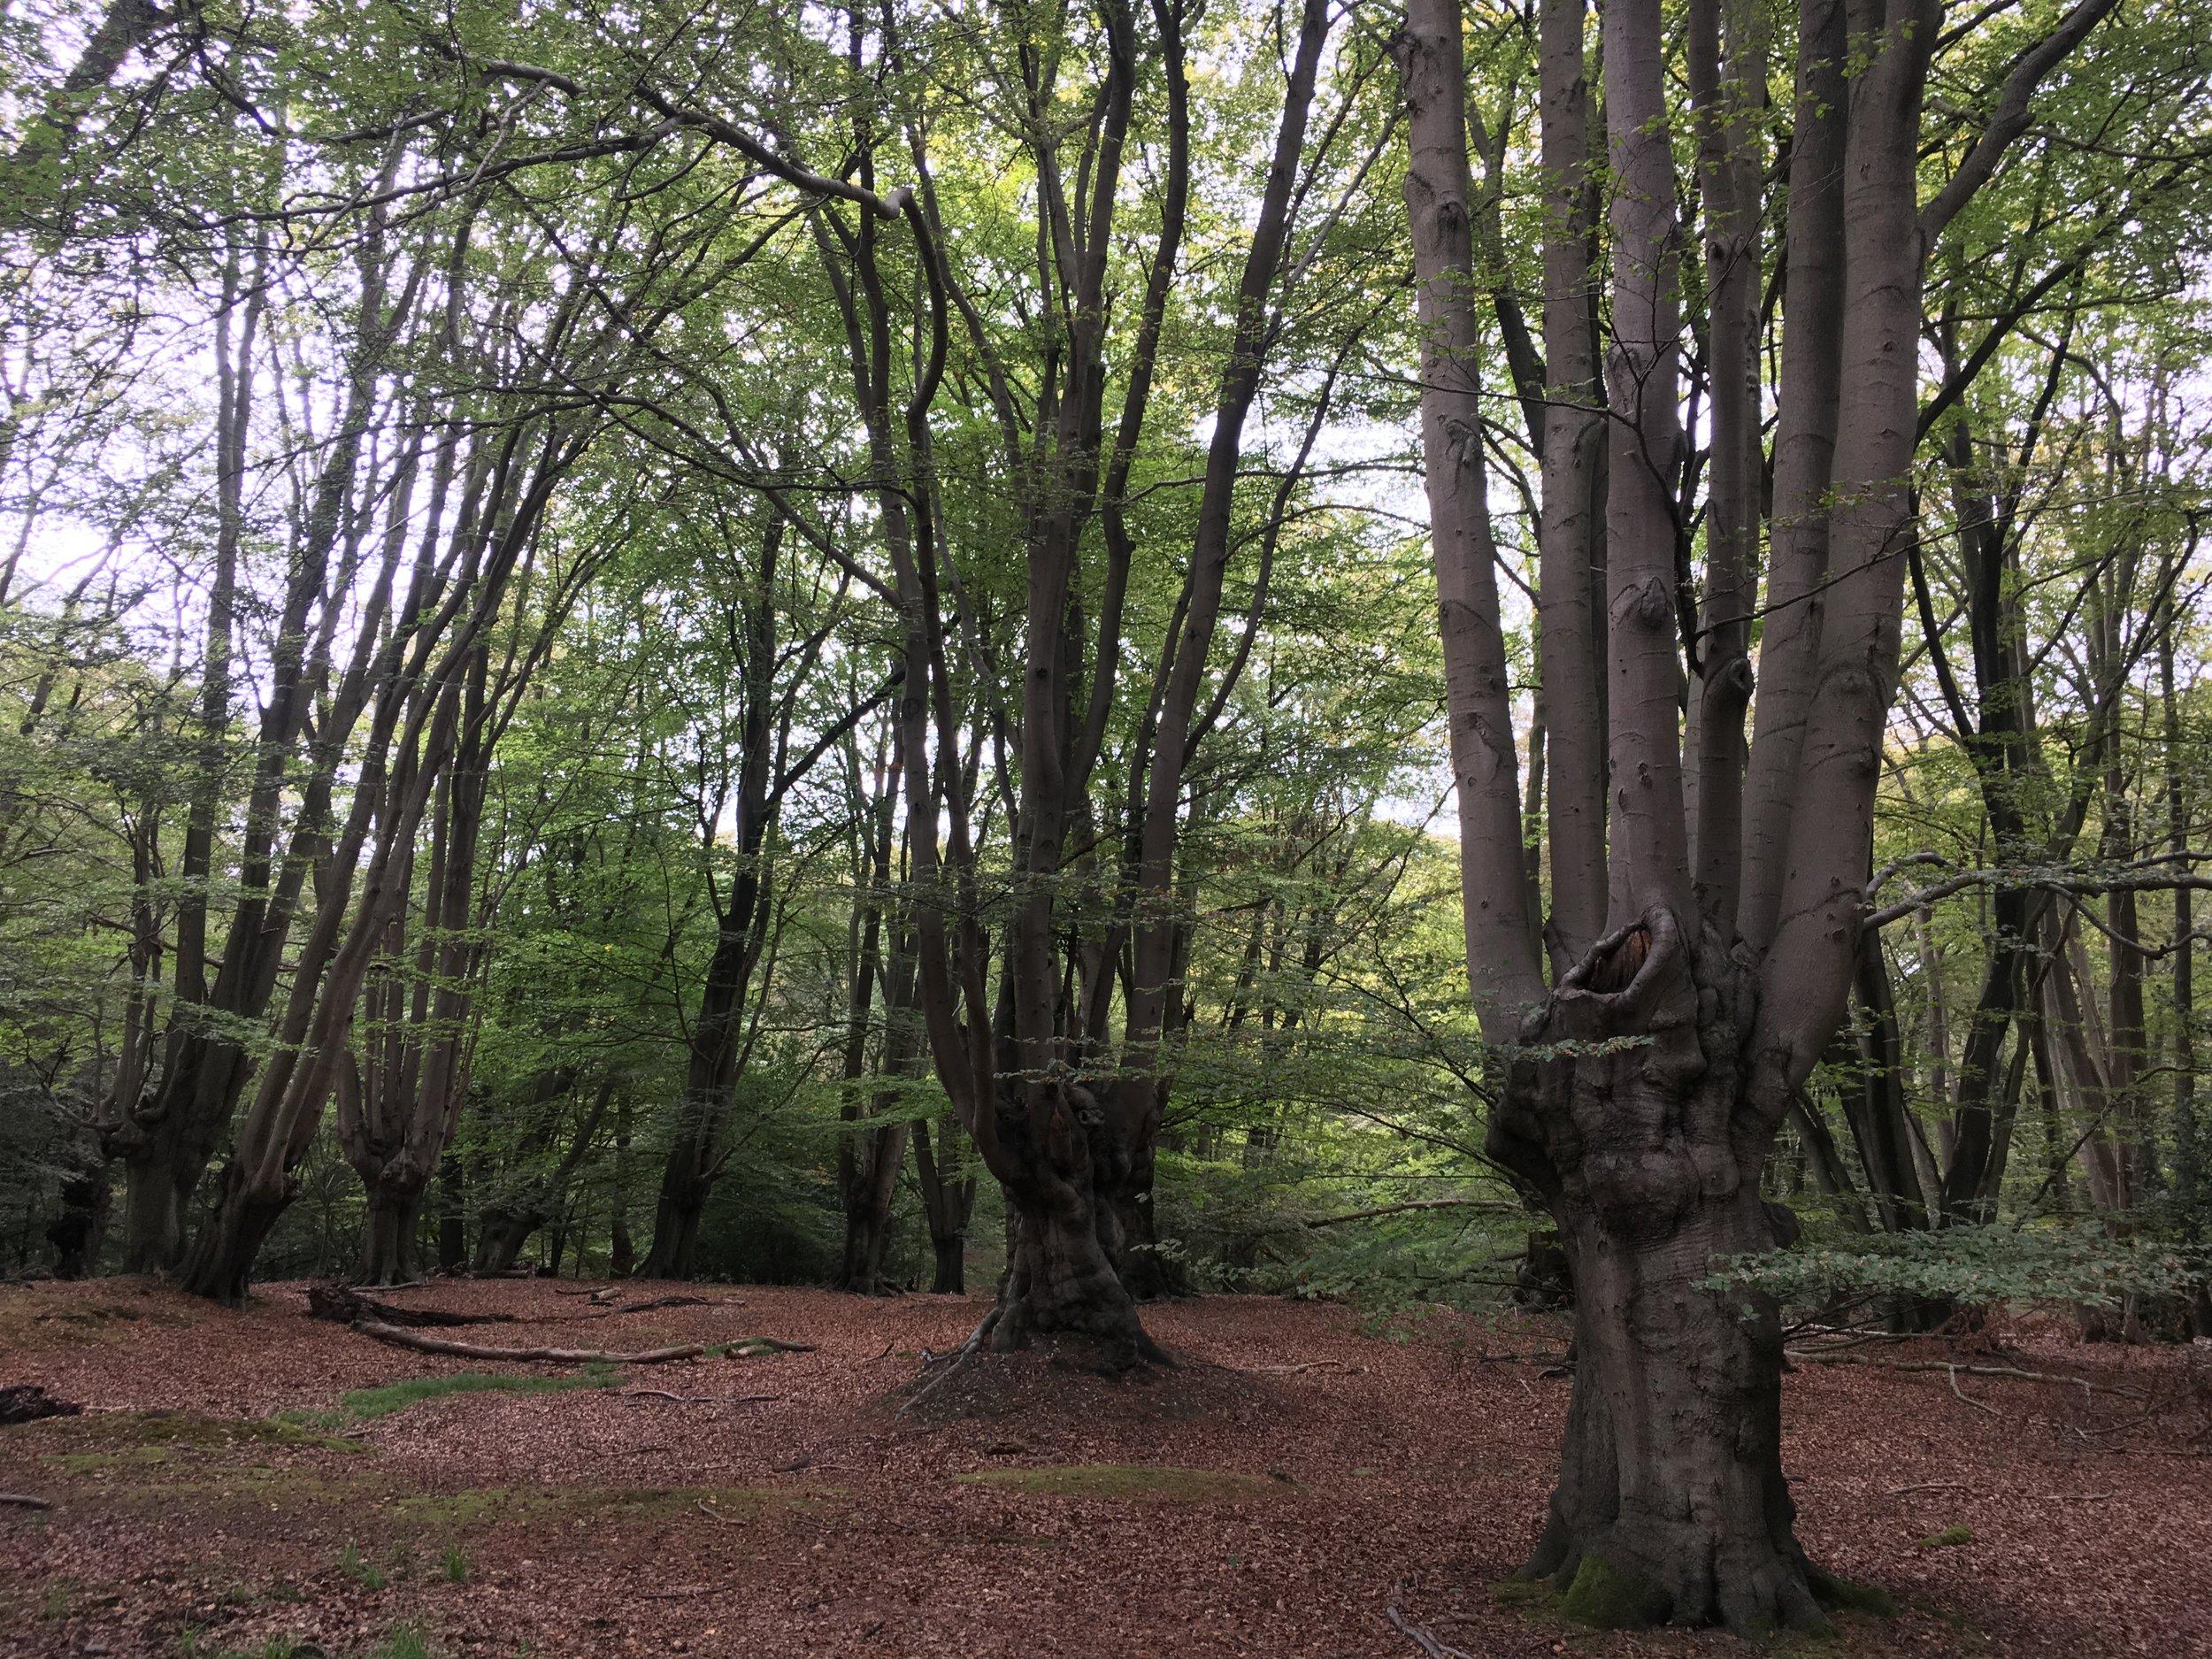 Pollarded trees, Staples Hill, Loughton 2019